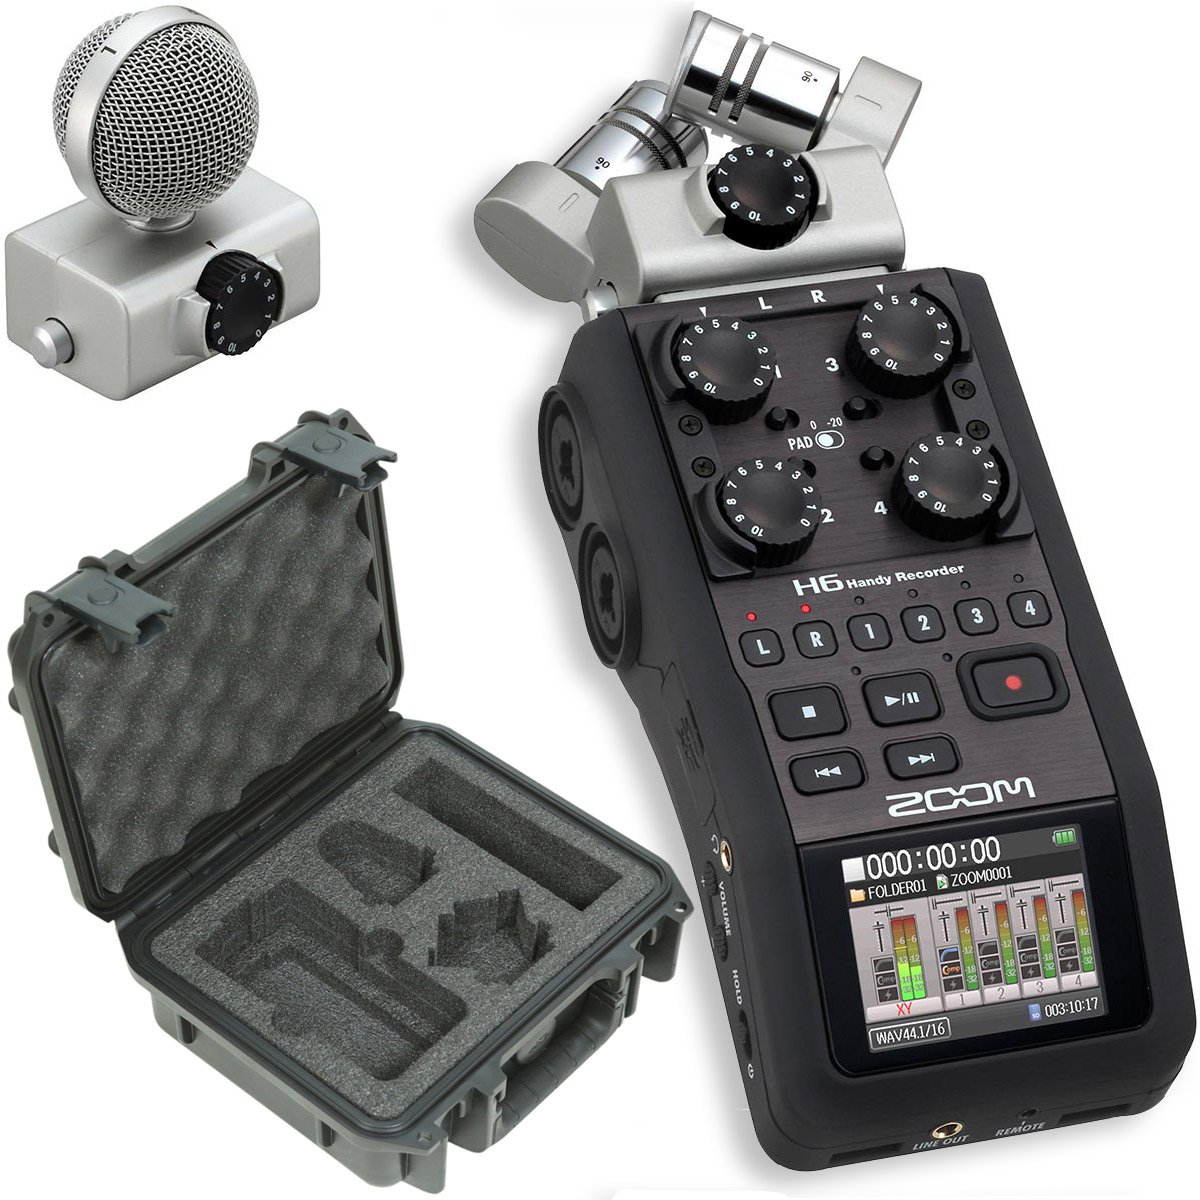 Zoom H6 Portable Stereo Recorder & SKB 3i-0907-4-H6 Waterproof Hard Case - Bundle